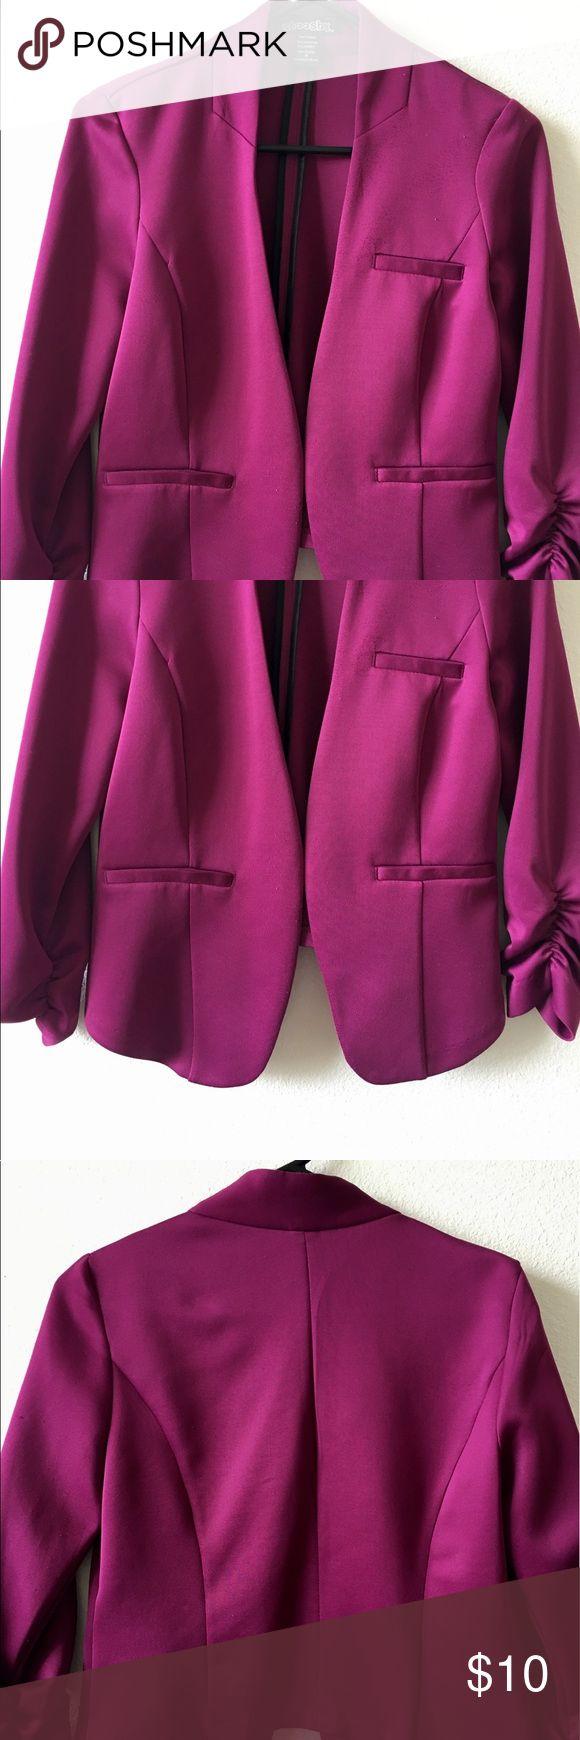 Purple Blazer Brand: Stooshy, Color: Purple, Size: Medium, Short Blazer, 3/4 ruched sleeve, No buttons, No Pockets, No zippers, No inside linning. No stains, No tears, No damage. Jackets & Coats Blazers